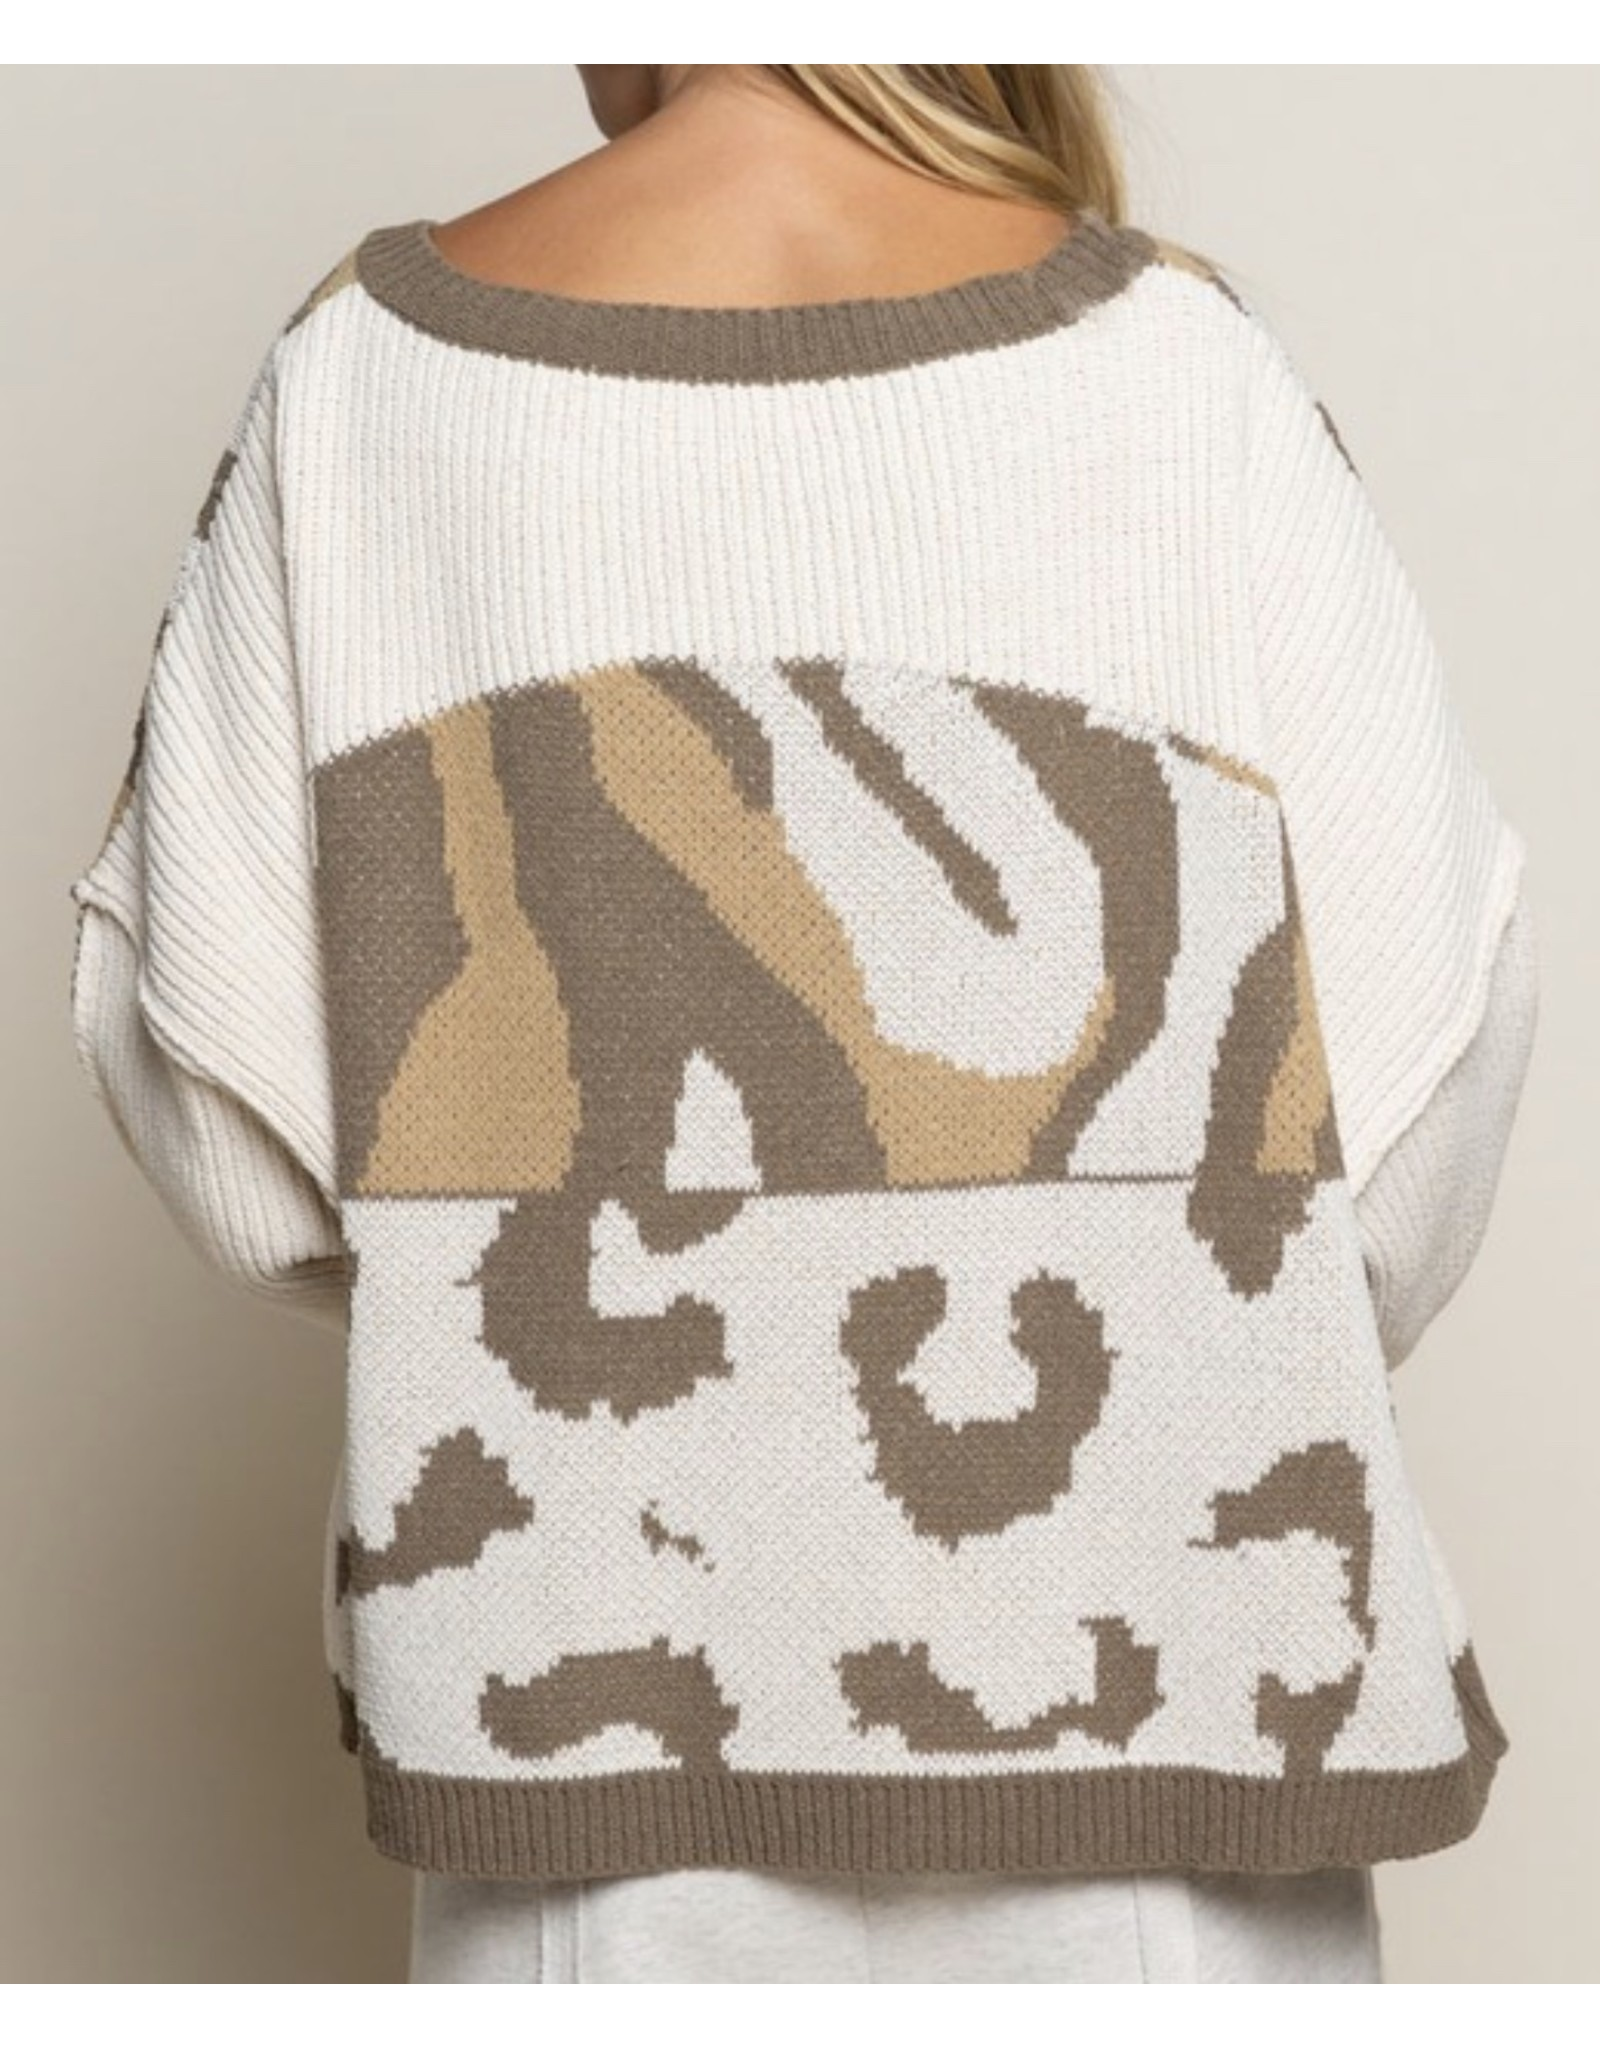 Camo Color Block Sweater - Olive